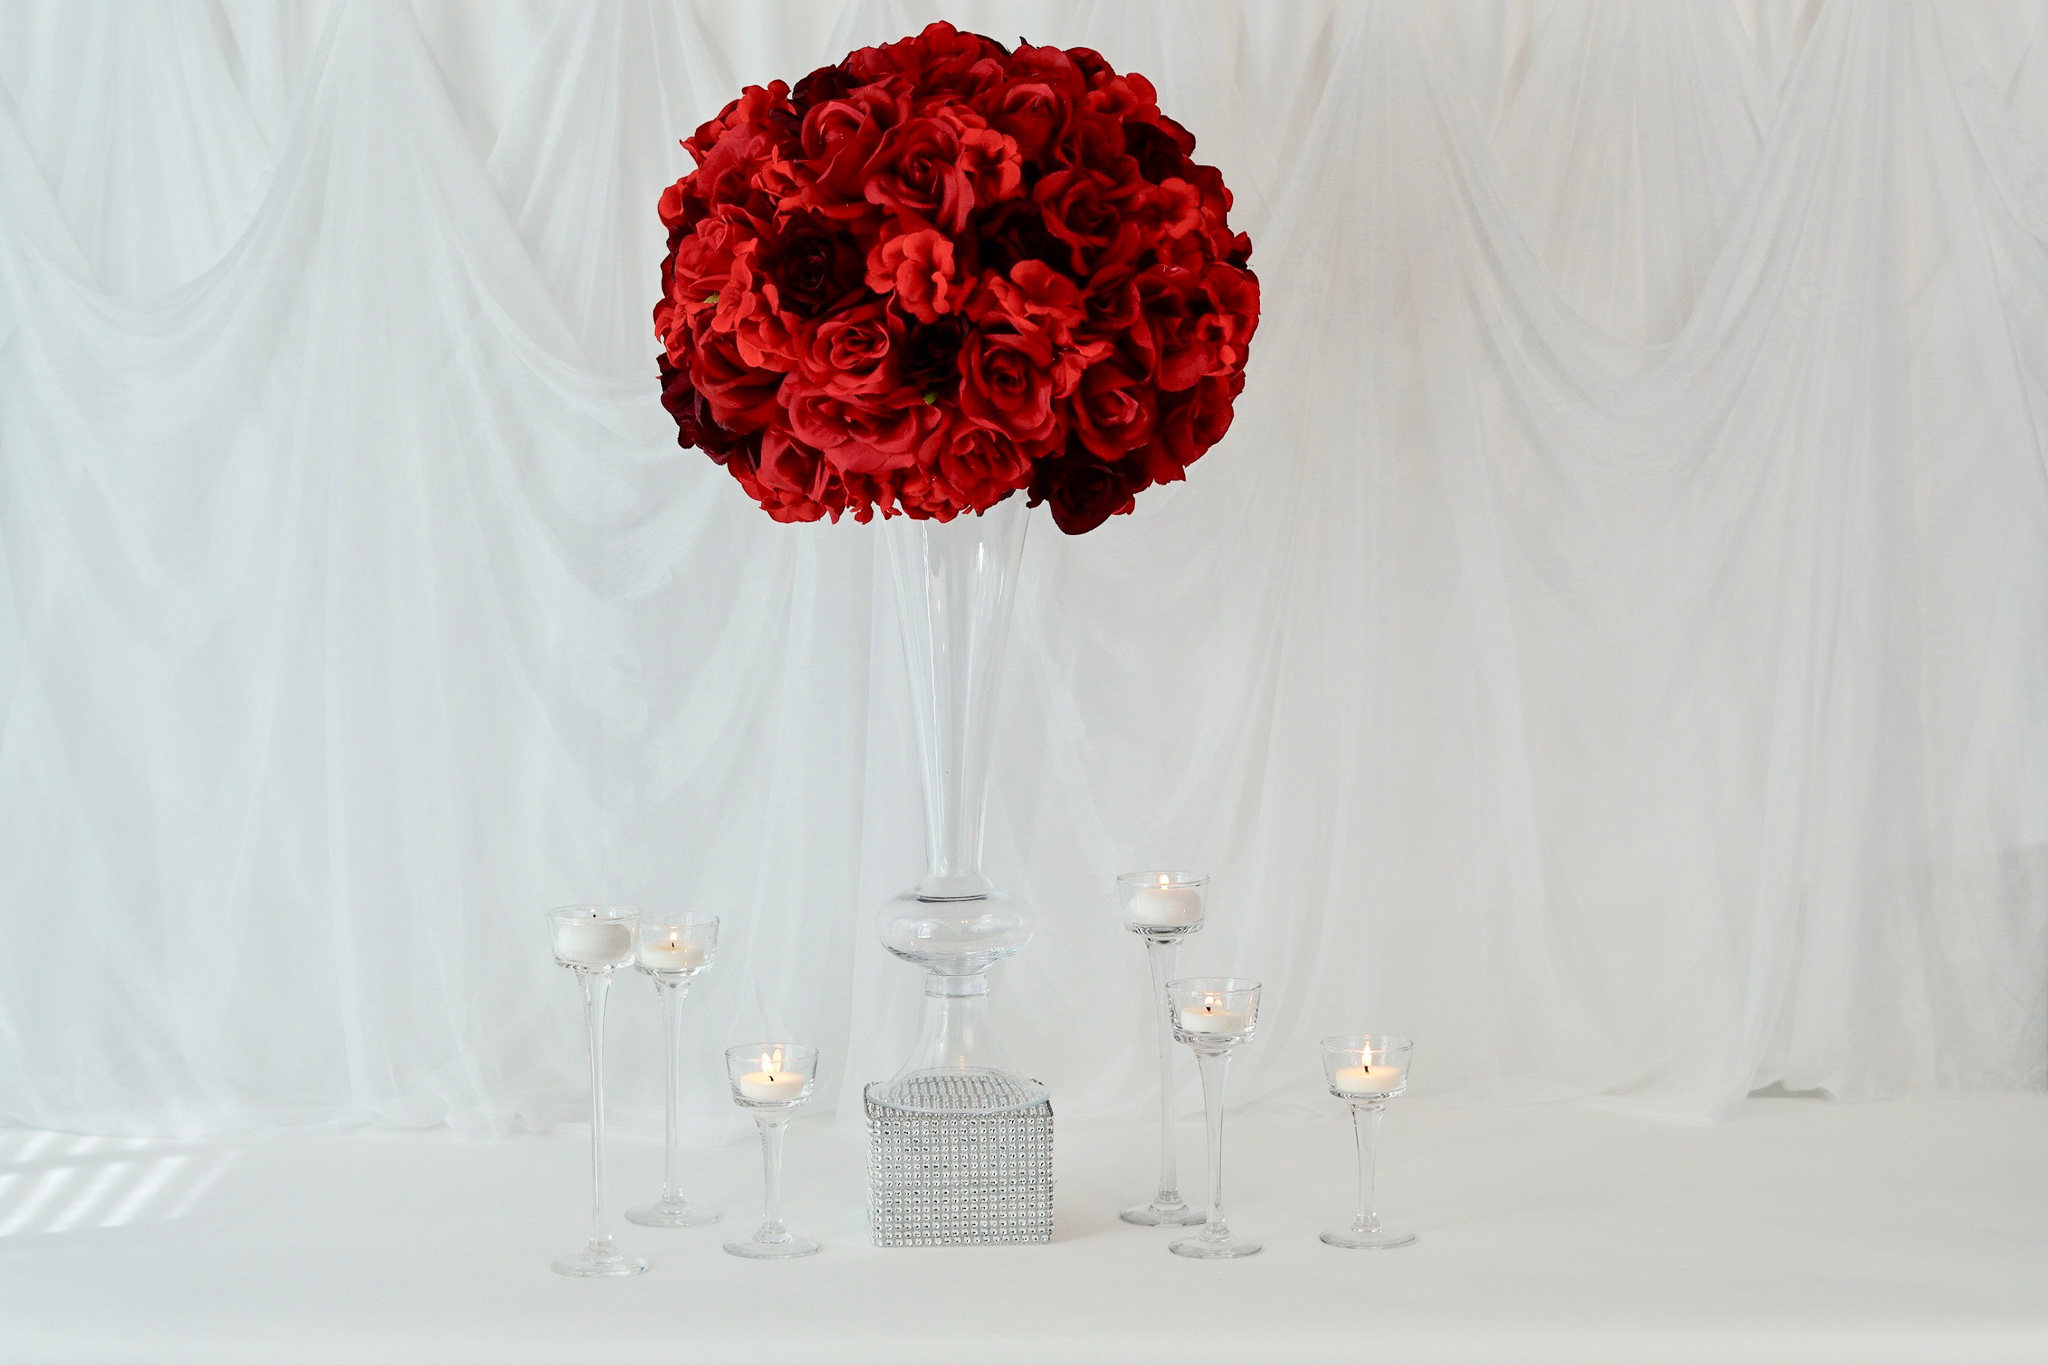 Diy Tall Glam Red Rose Wedding Centerpieces With Bonus Pedestal Under 5